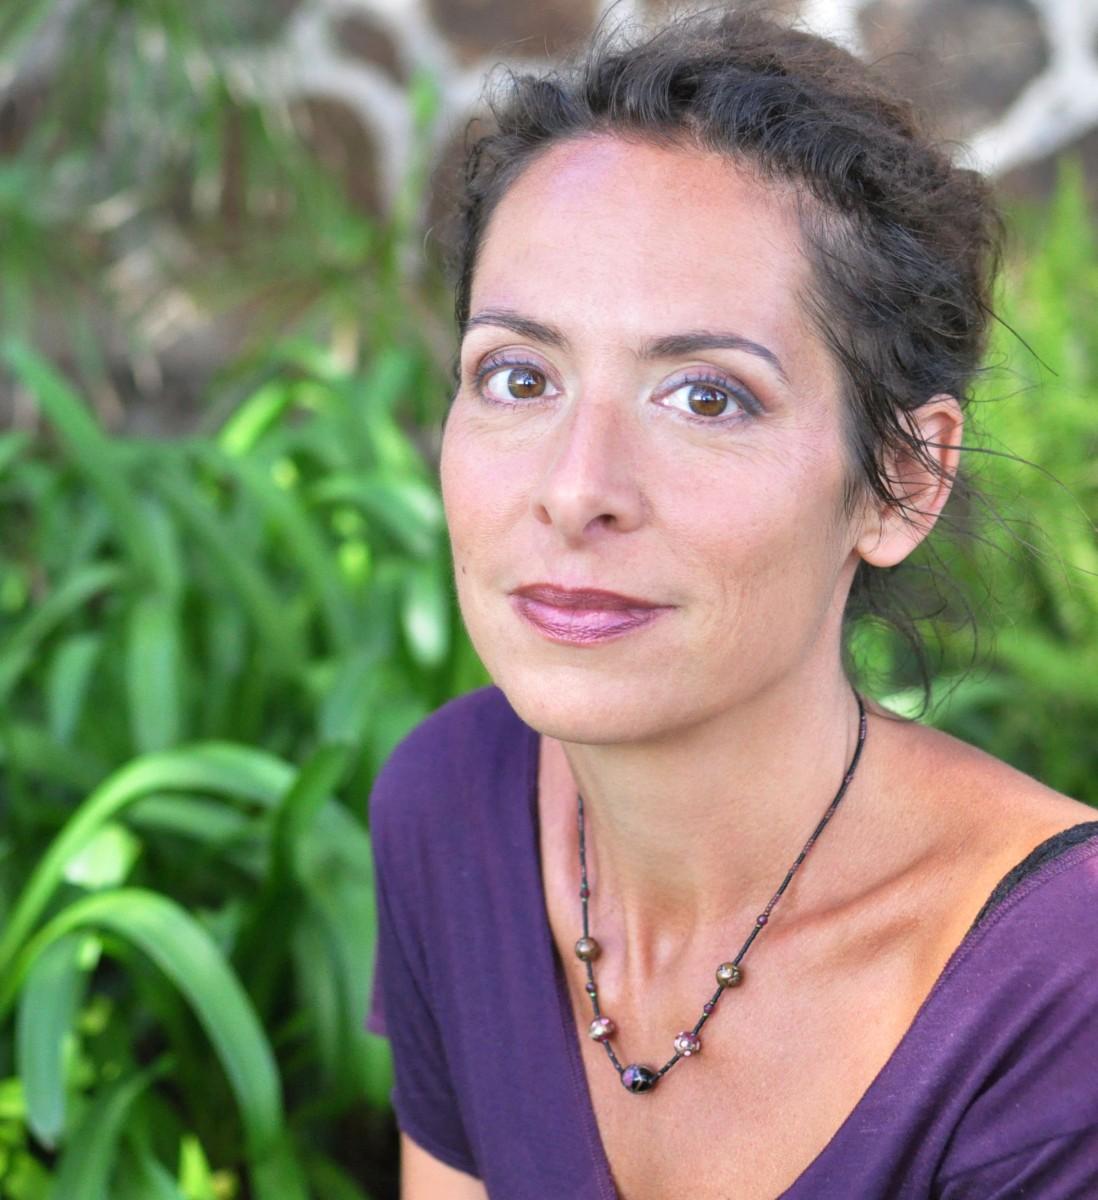 Instructor Vanessa Nixon Klein - Tutoring or Consulting